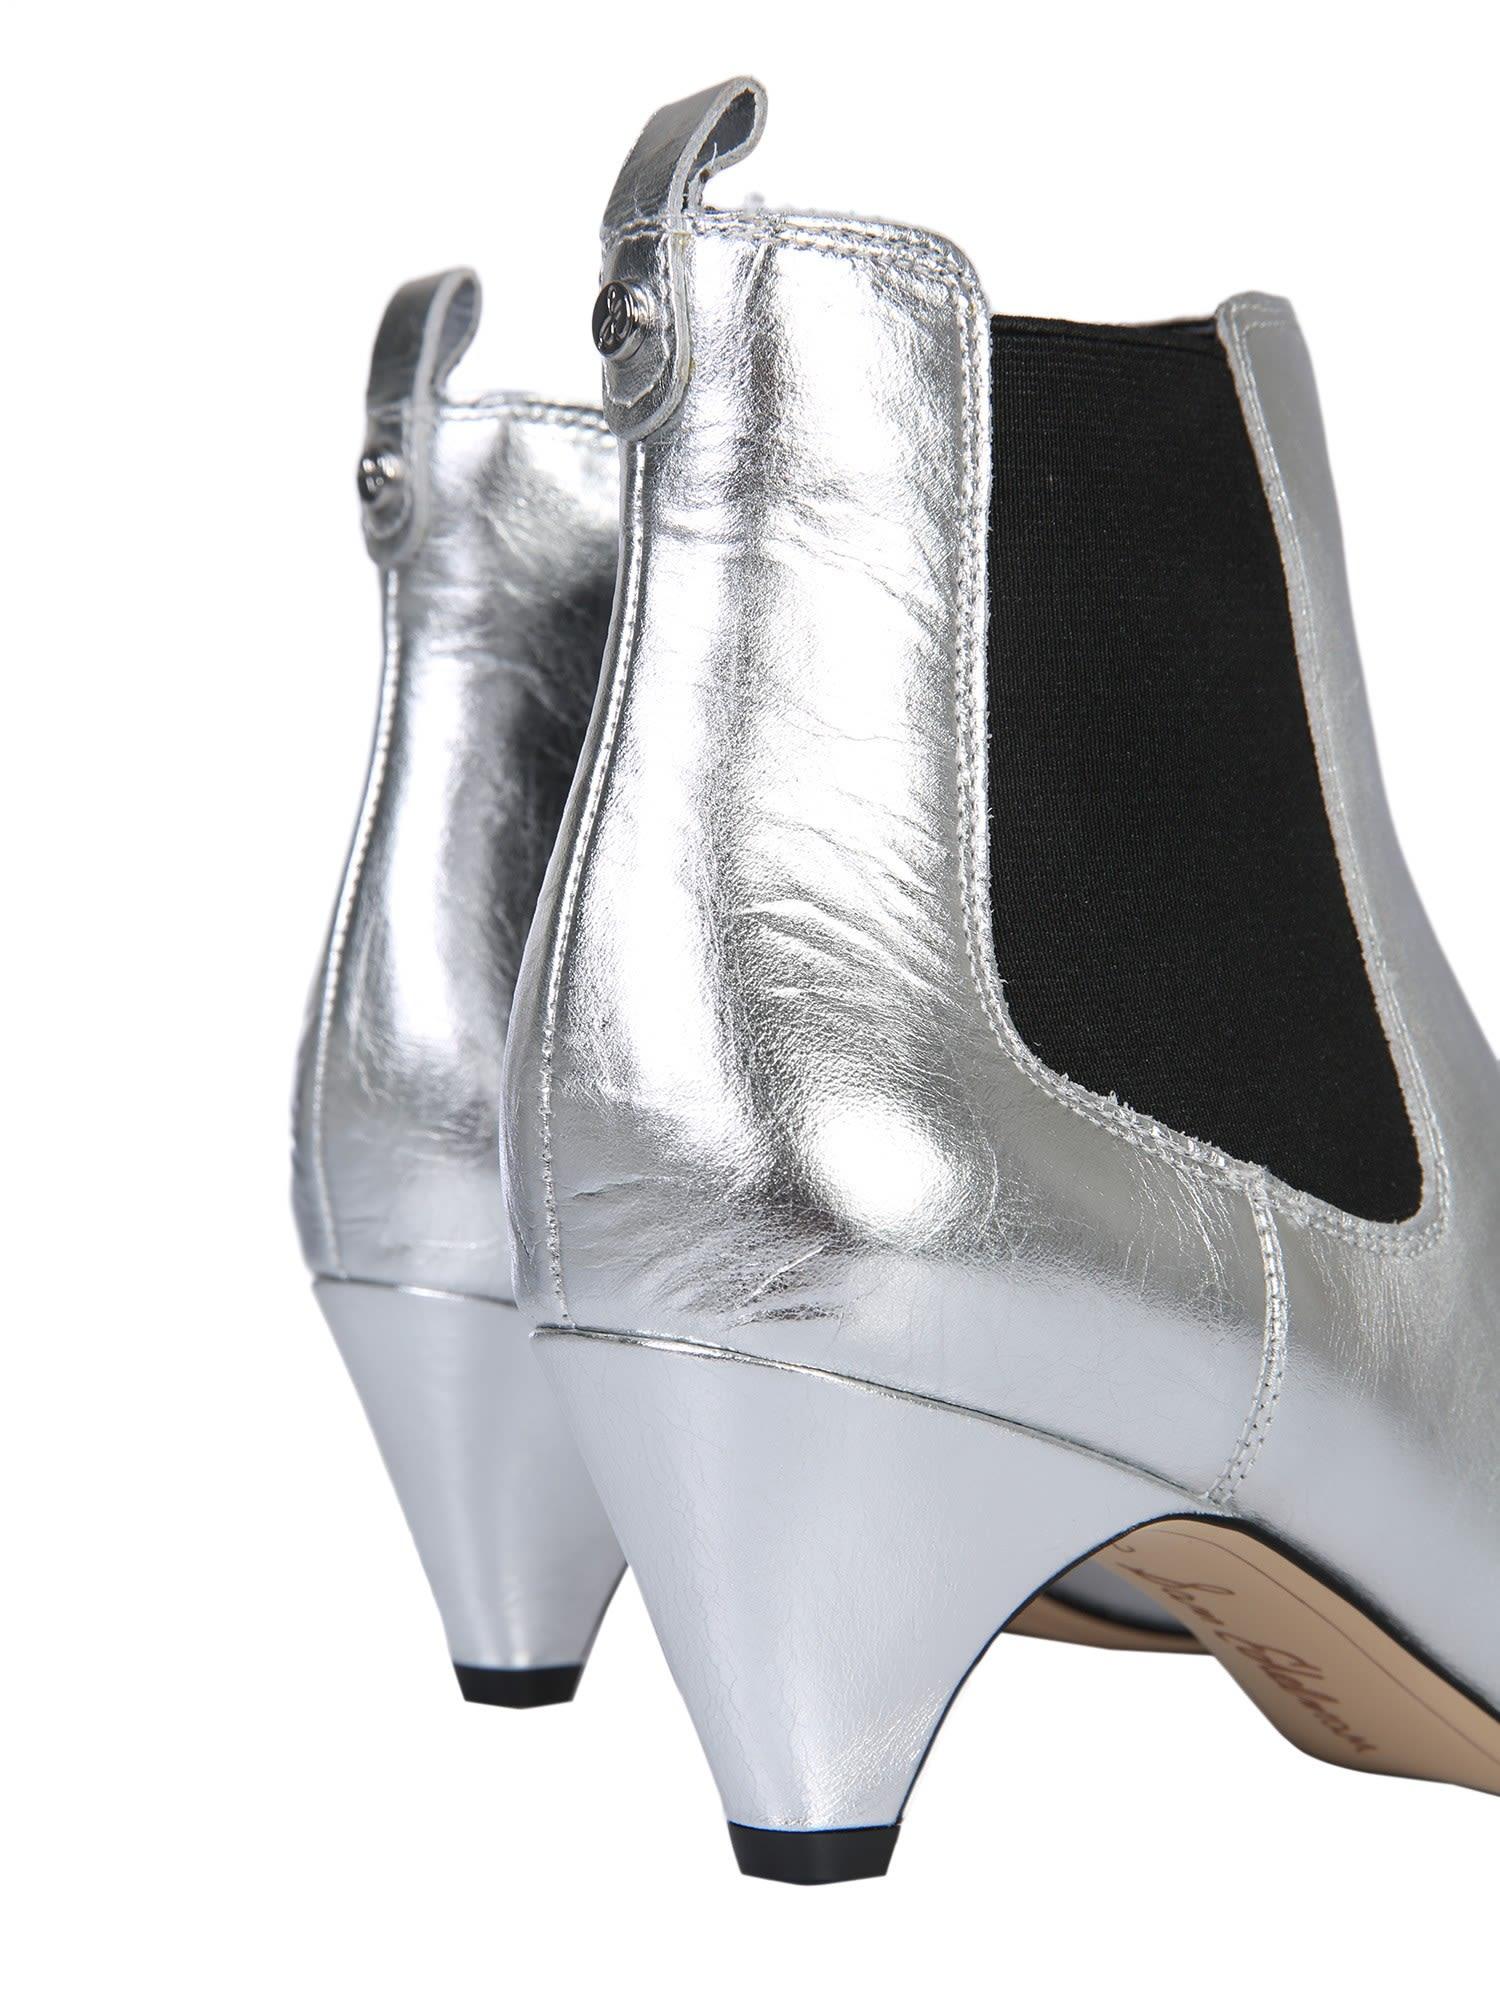 941dbf30ca4f Sam Edelman Sam Edelman Katt Ankle Boots - ARGENTO - 10715805